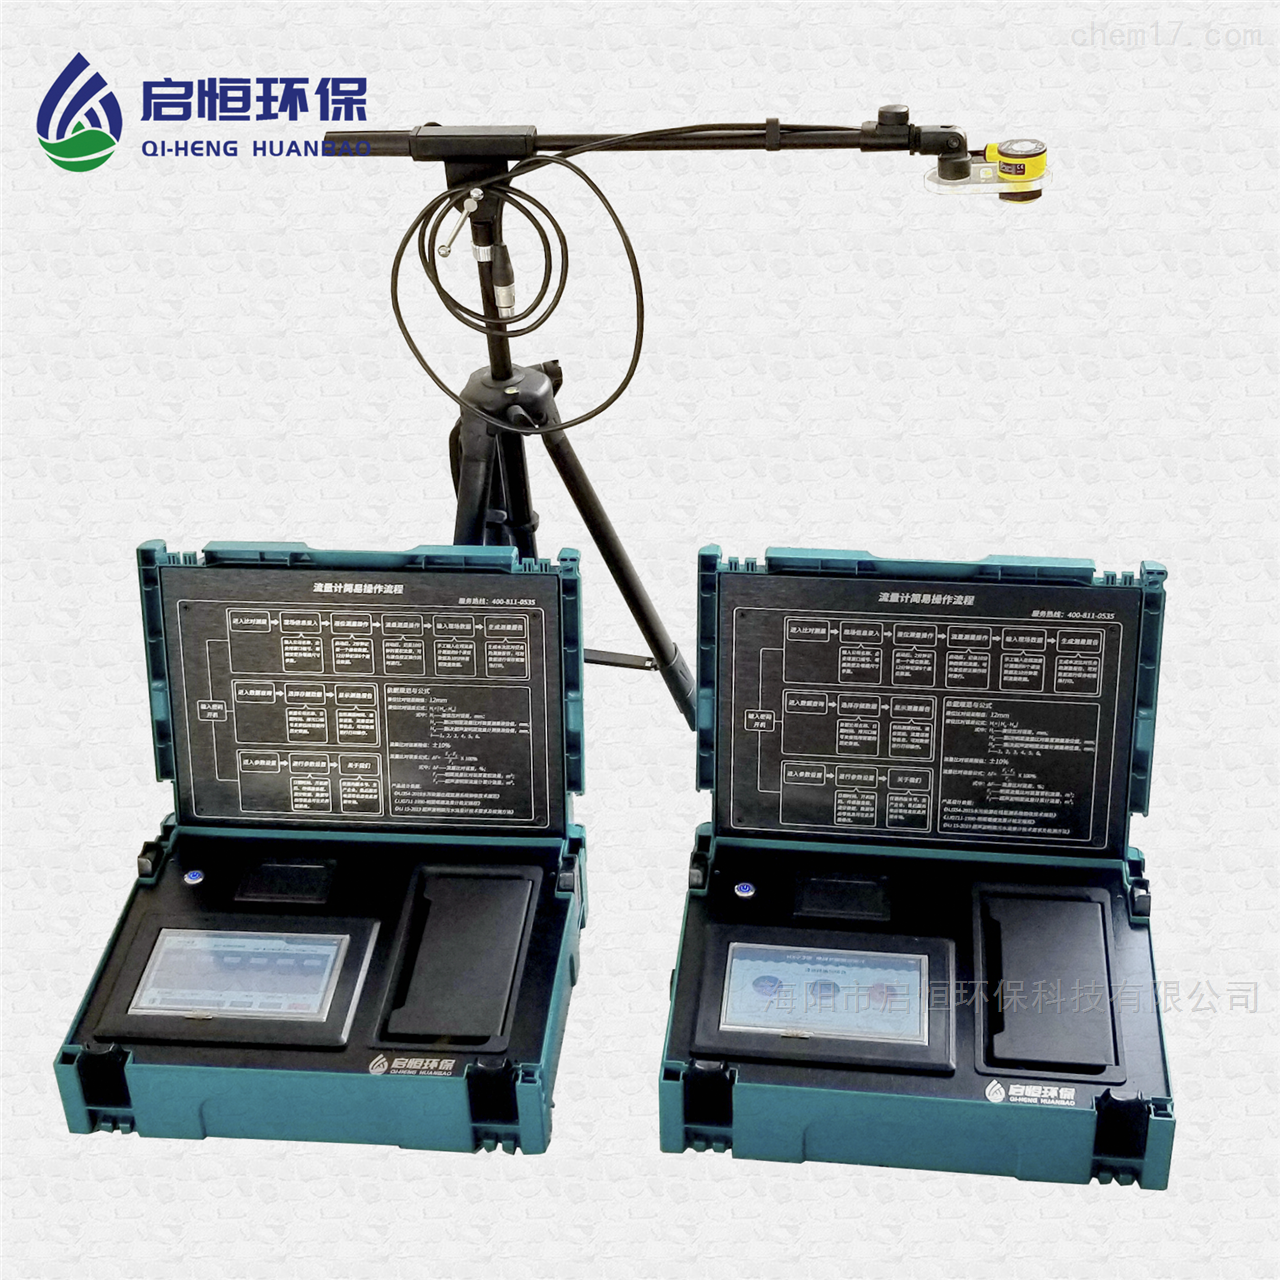 HX-F3型便携式明渠流量计